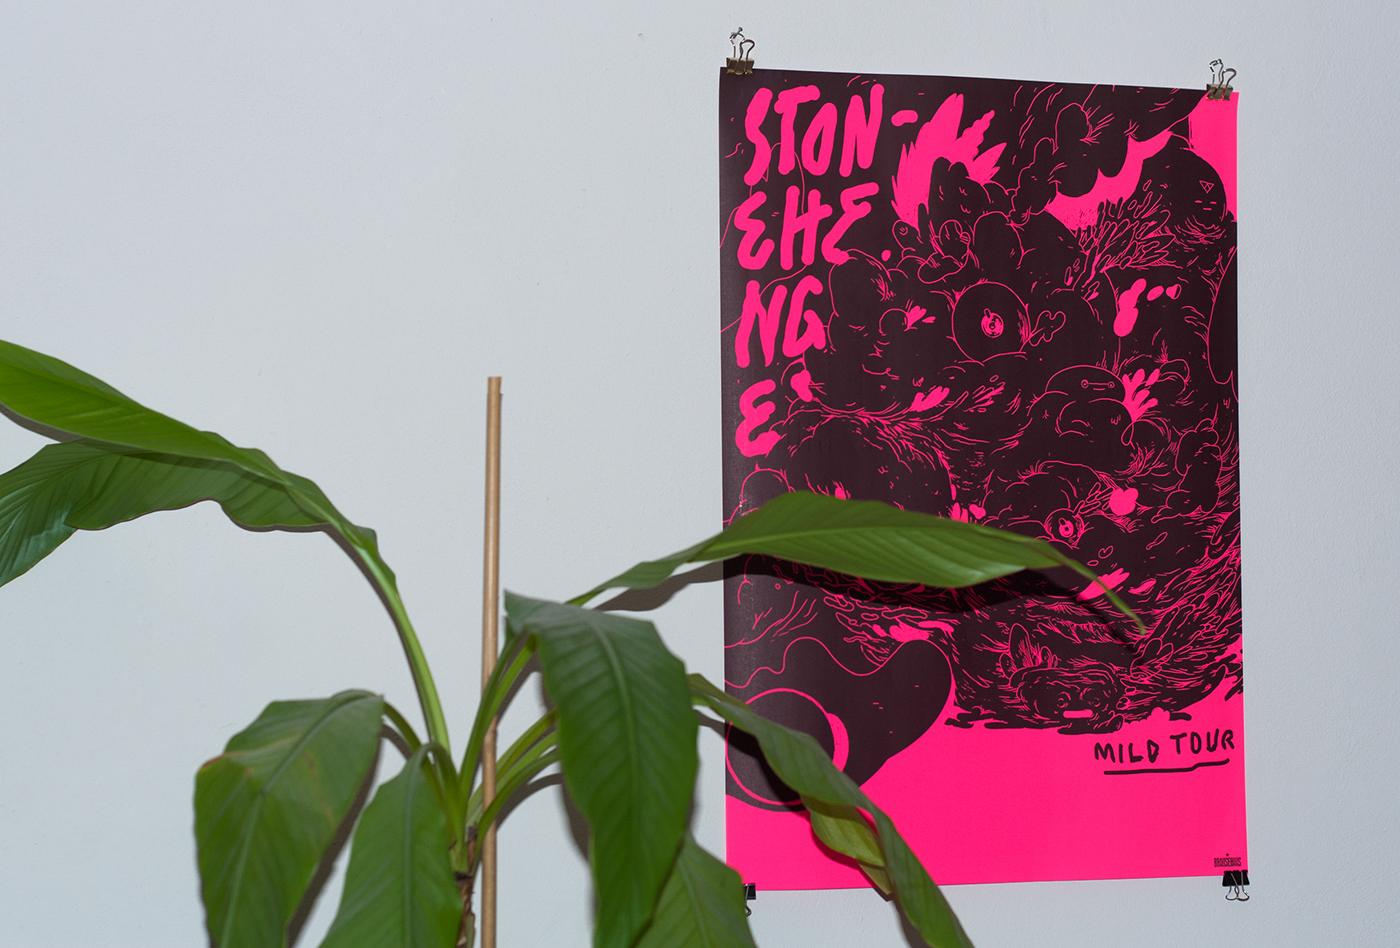 vinyl cover rock psychedelic creatures comic Character Nature vivid crazy